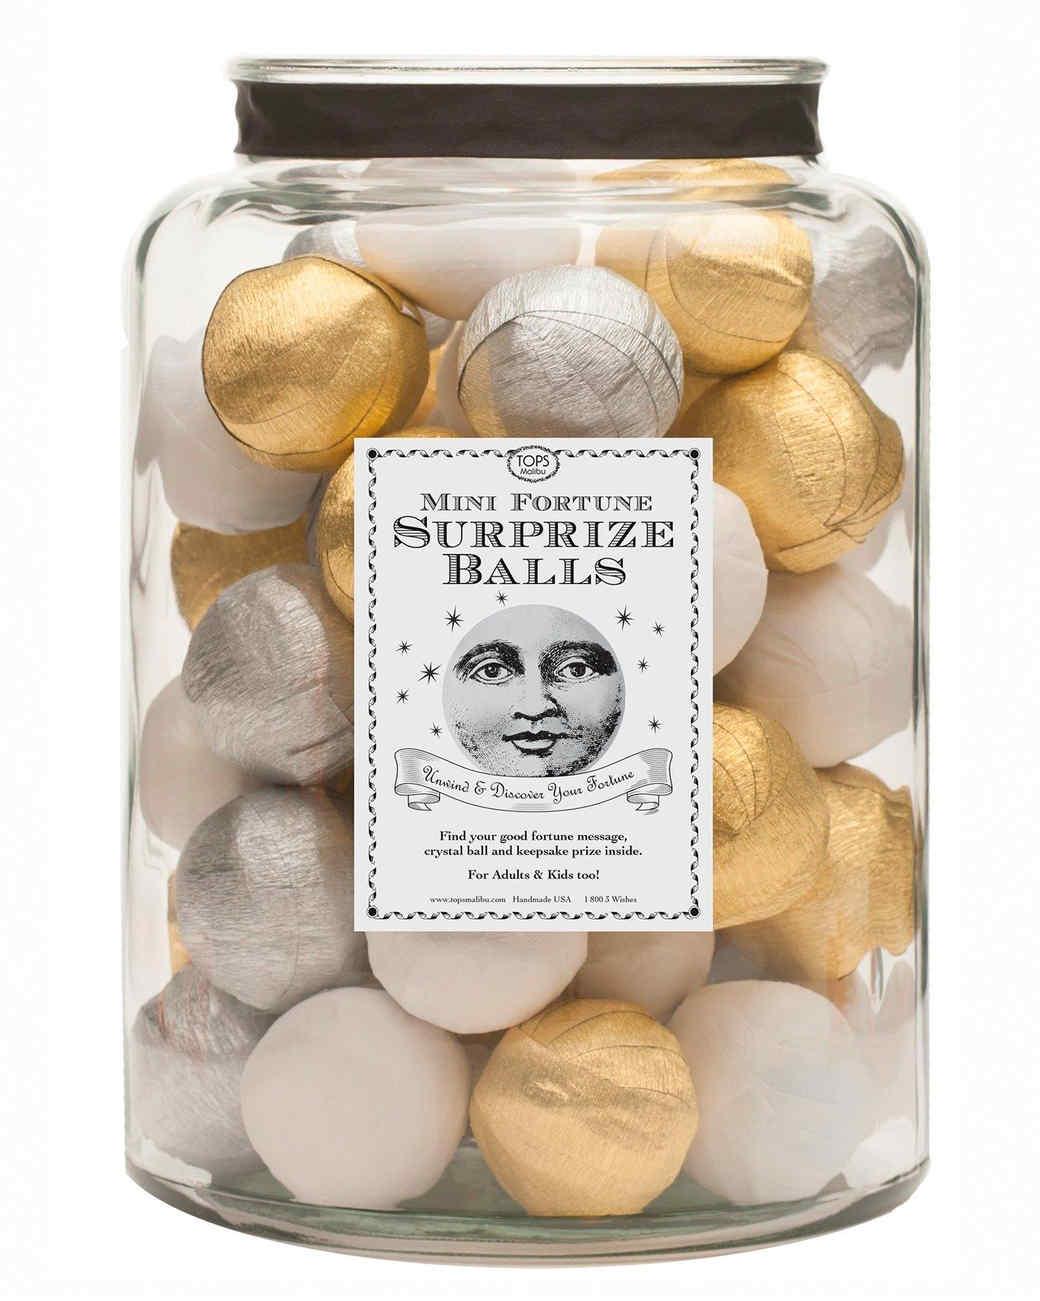 tops-malibu-metallic-fortune-balls-0914.jpg